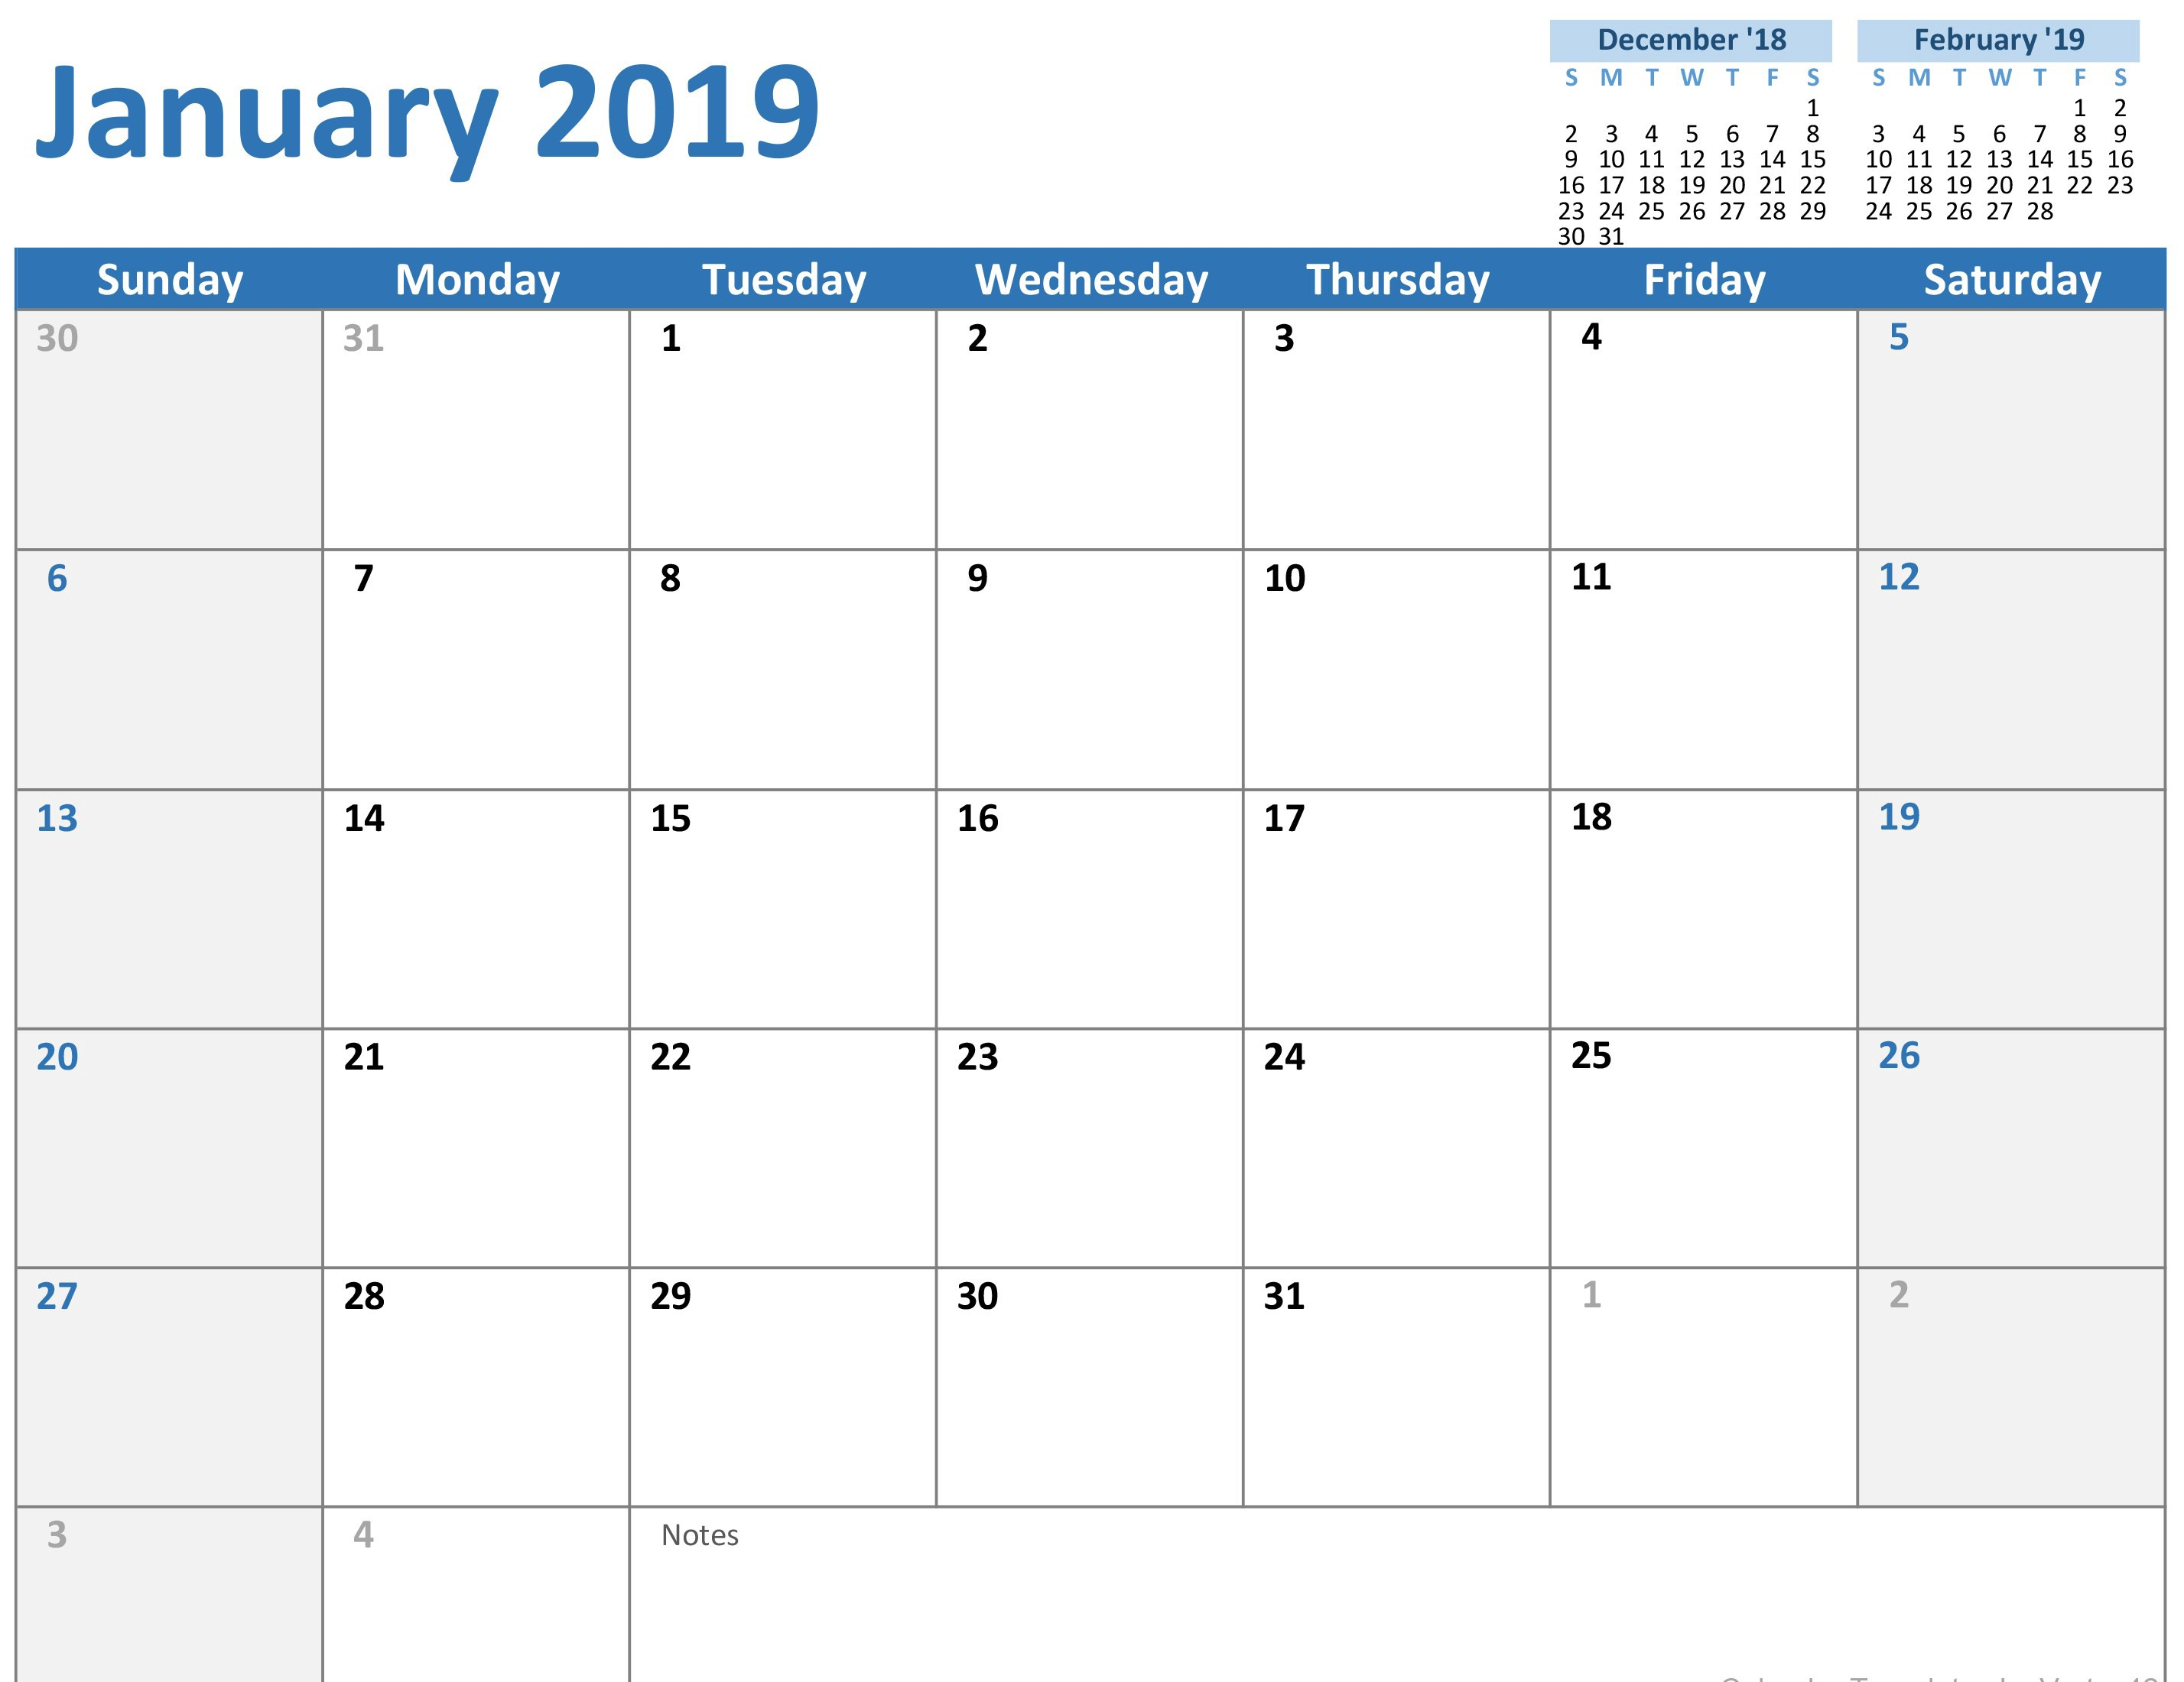 Custom Calendar For Schools – Marry Steven – Medium Calendar That You Can Edit